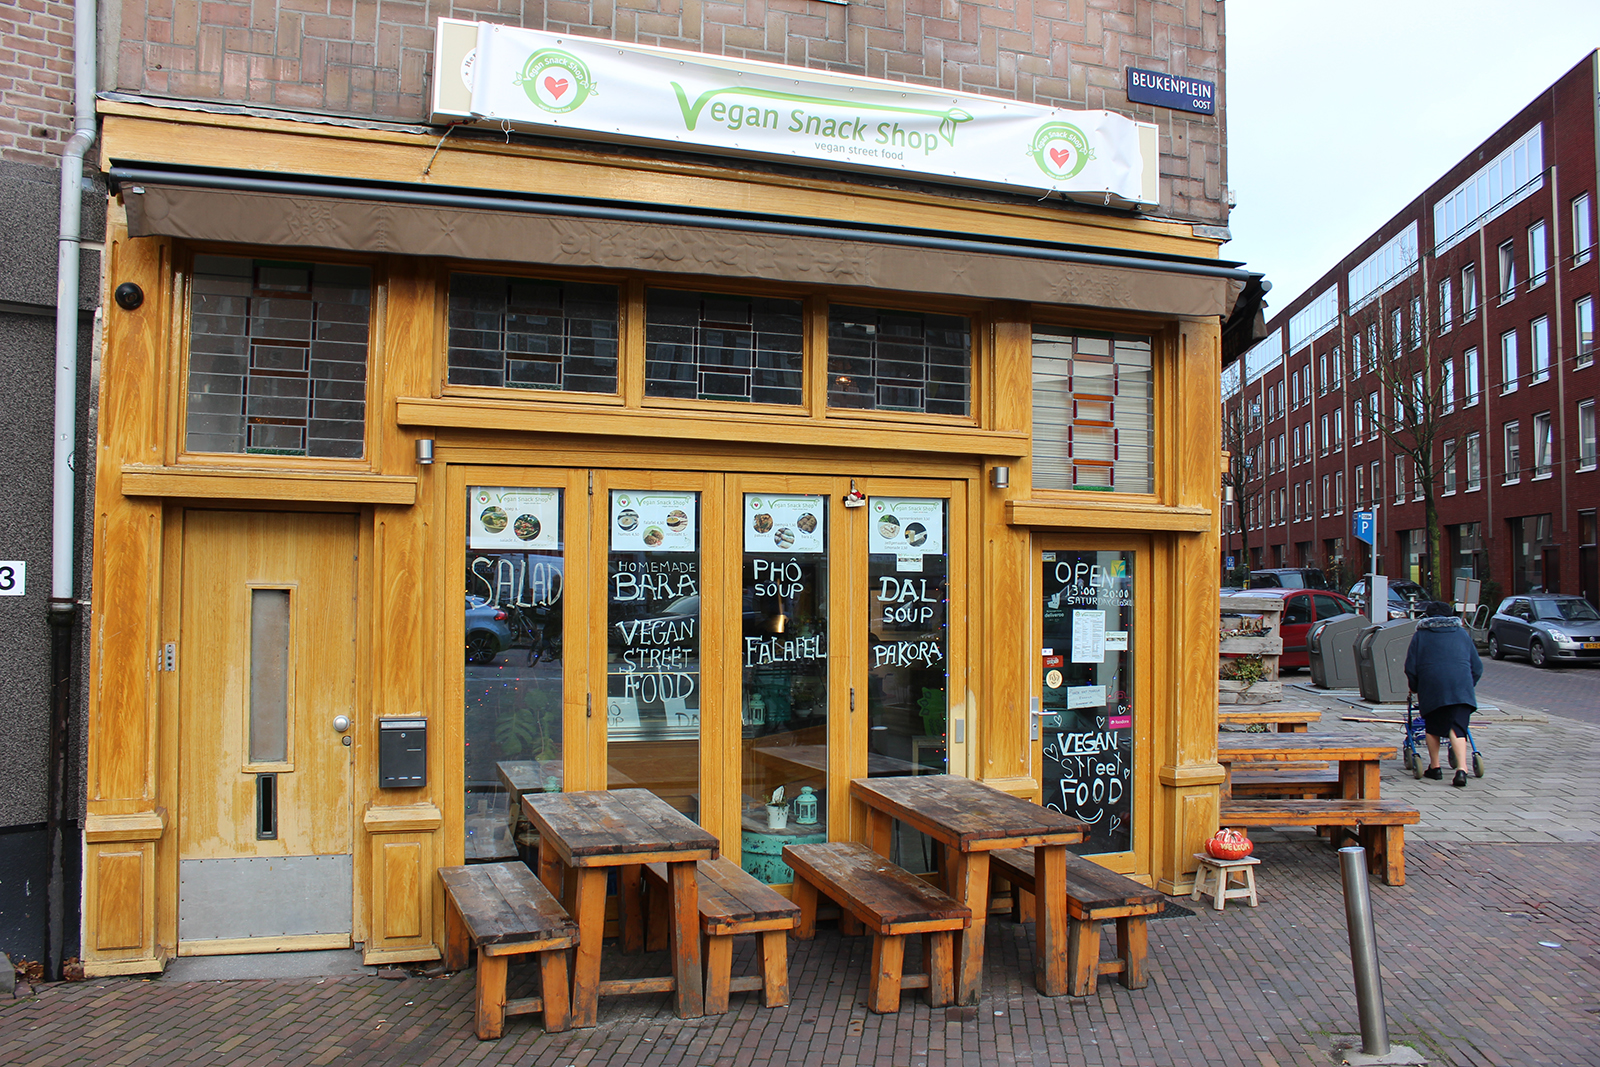 vegan snack shop amsterdam